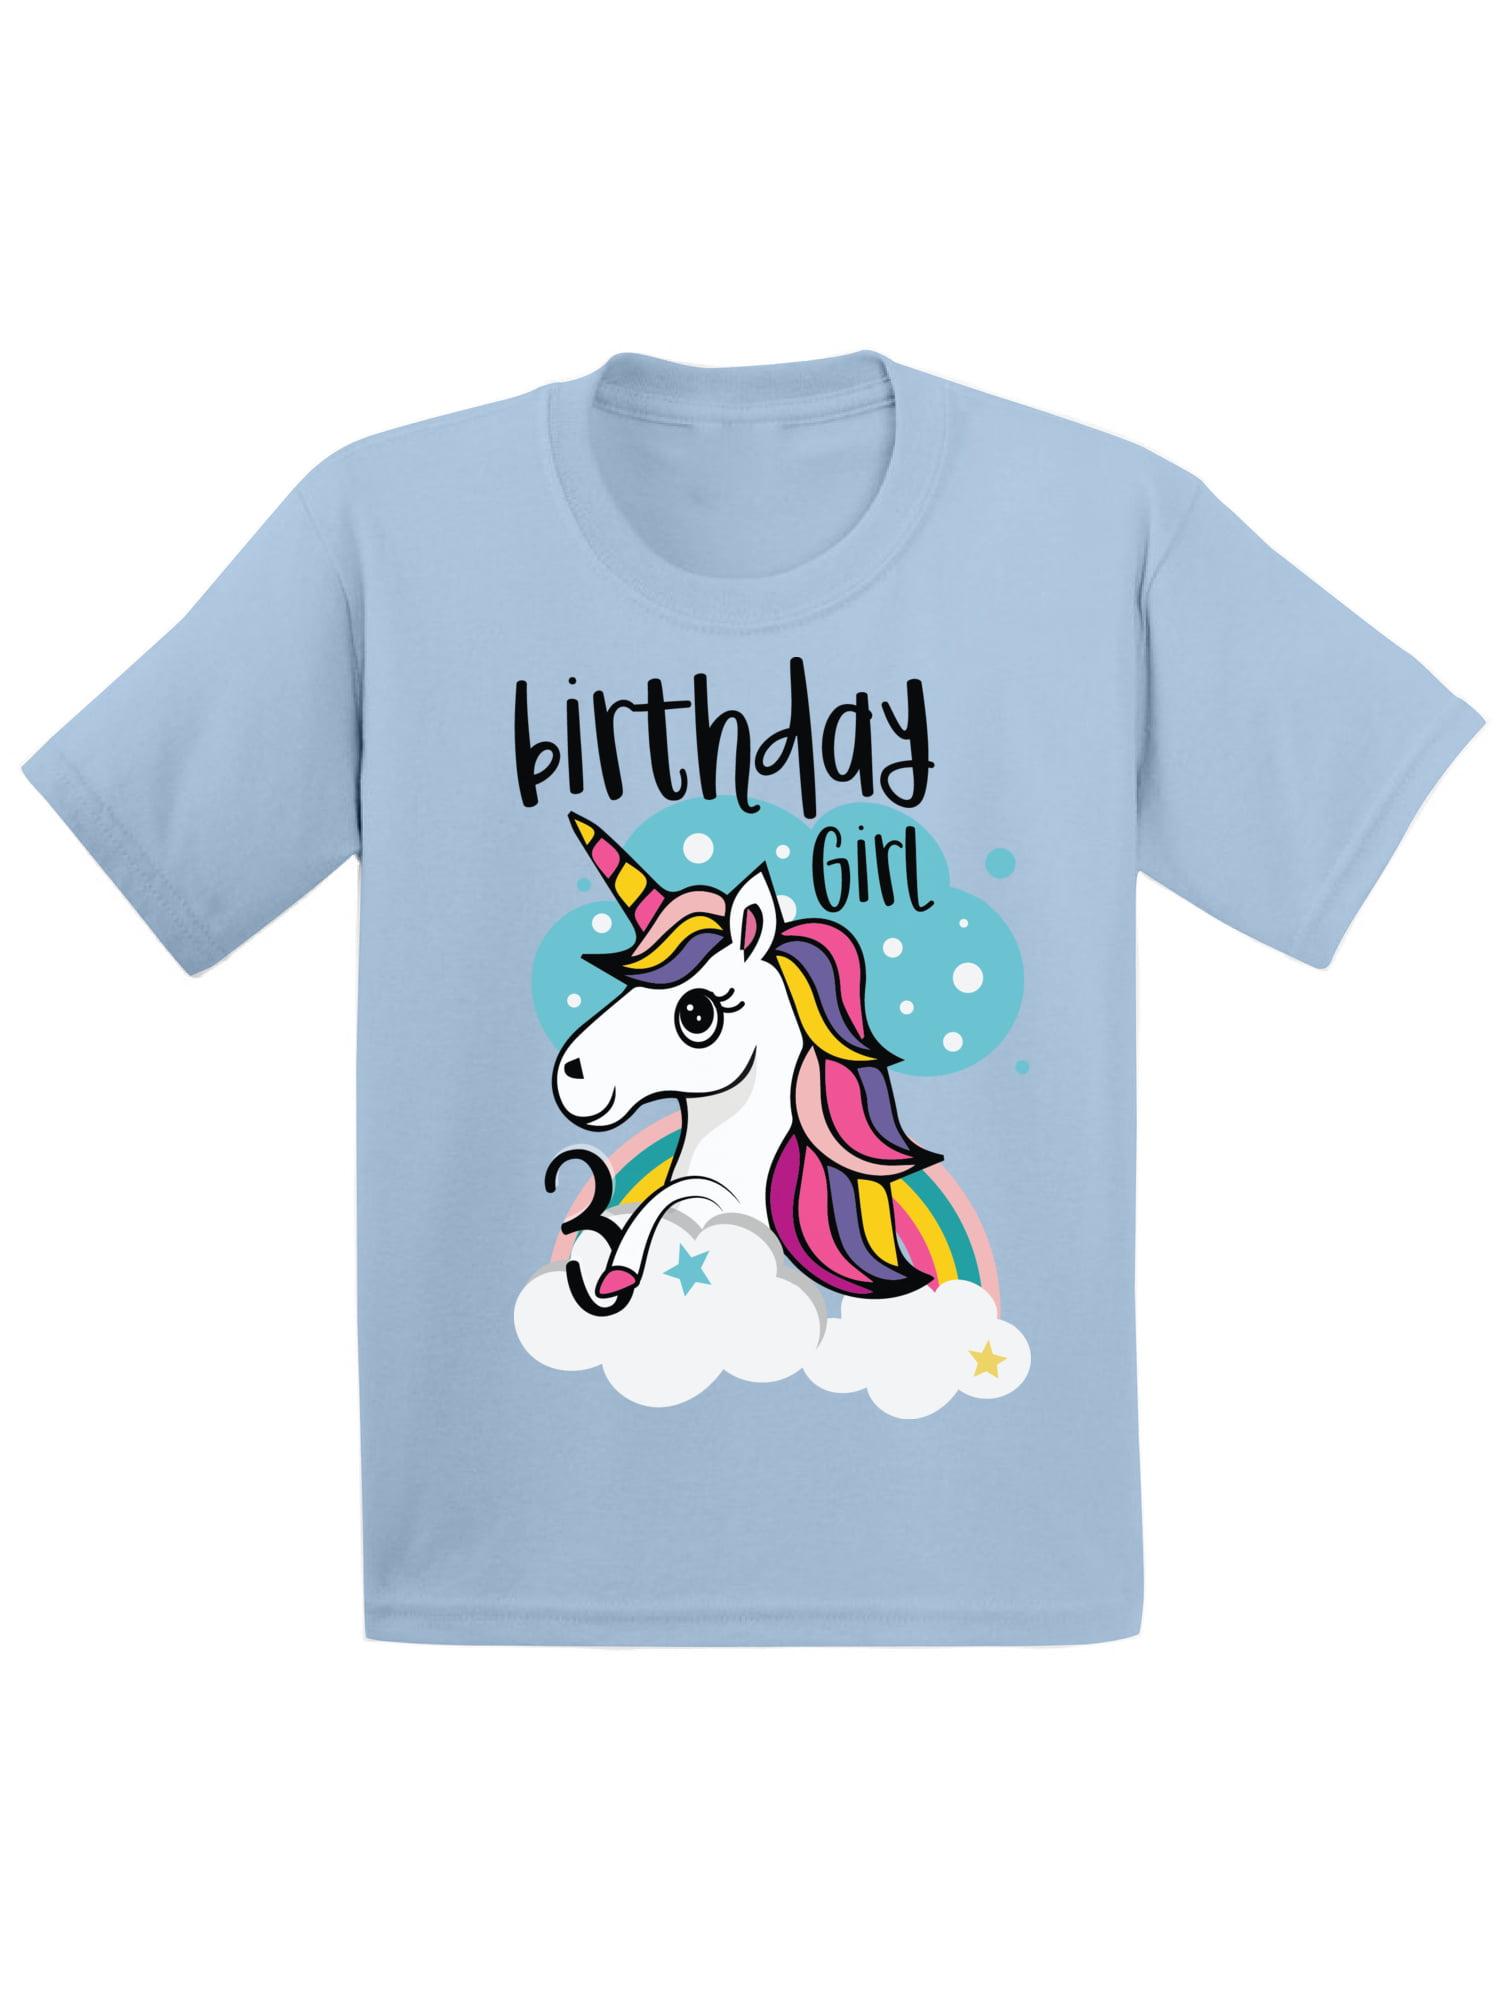 Awkward Styles Birthday Girl Toddler Raglan Unicorn Tshirt 4th Birthday Party